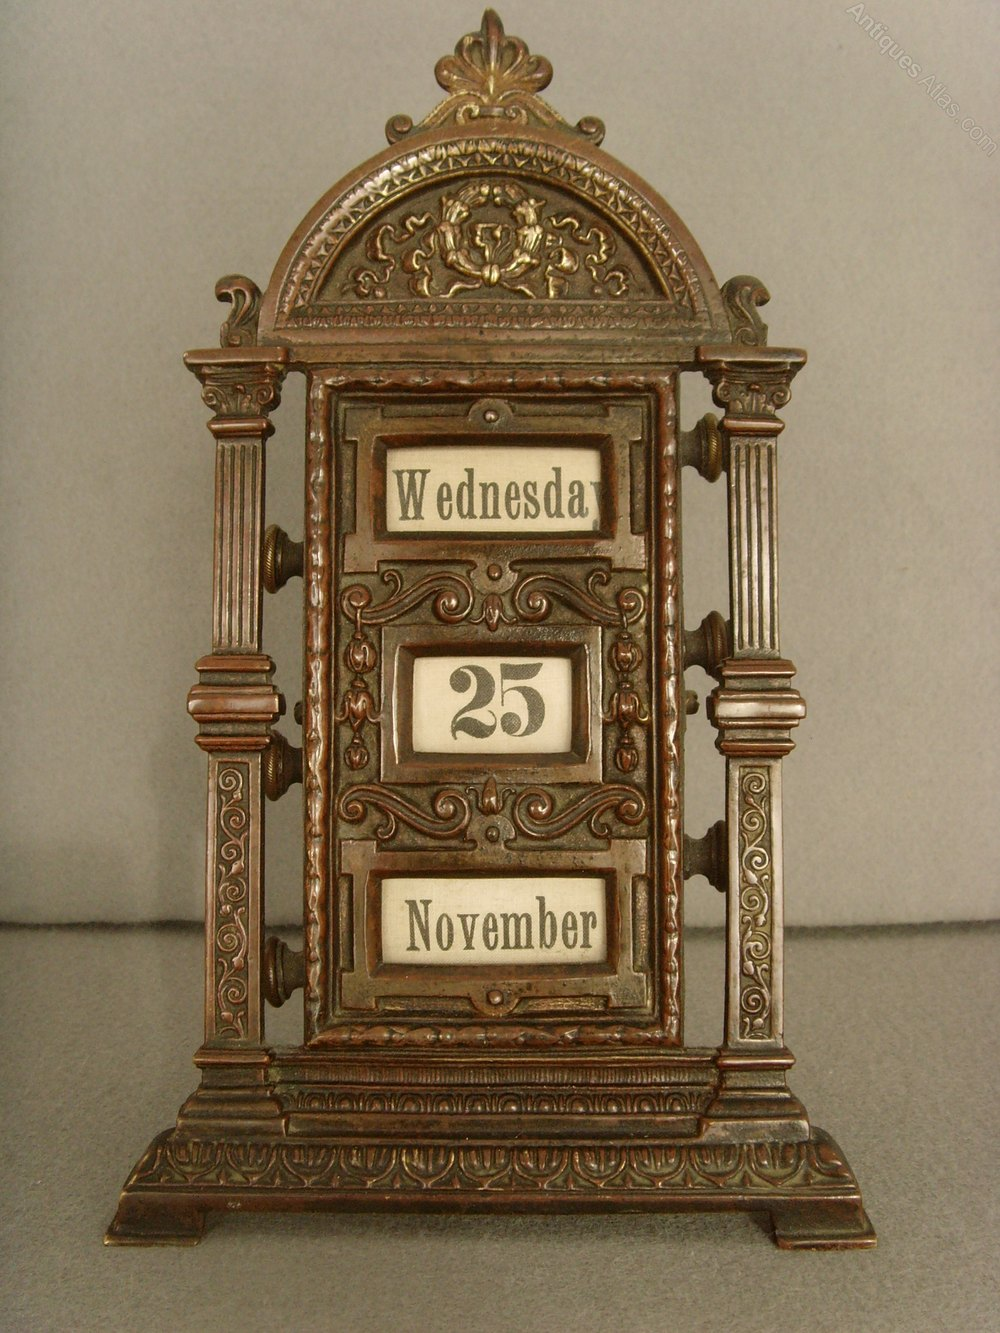 19th C. Patinated Brass Perpetual Desk Calendar Antique ... - Antiques Atlas - 19th C. Patinated Brass Perpetual Desk Calendar